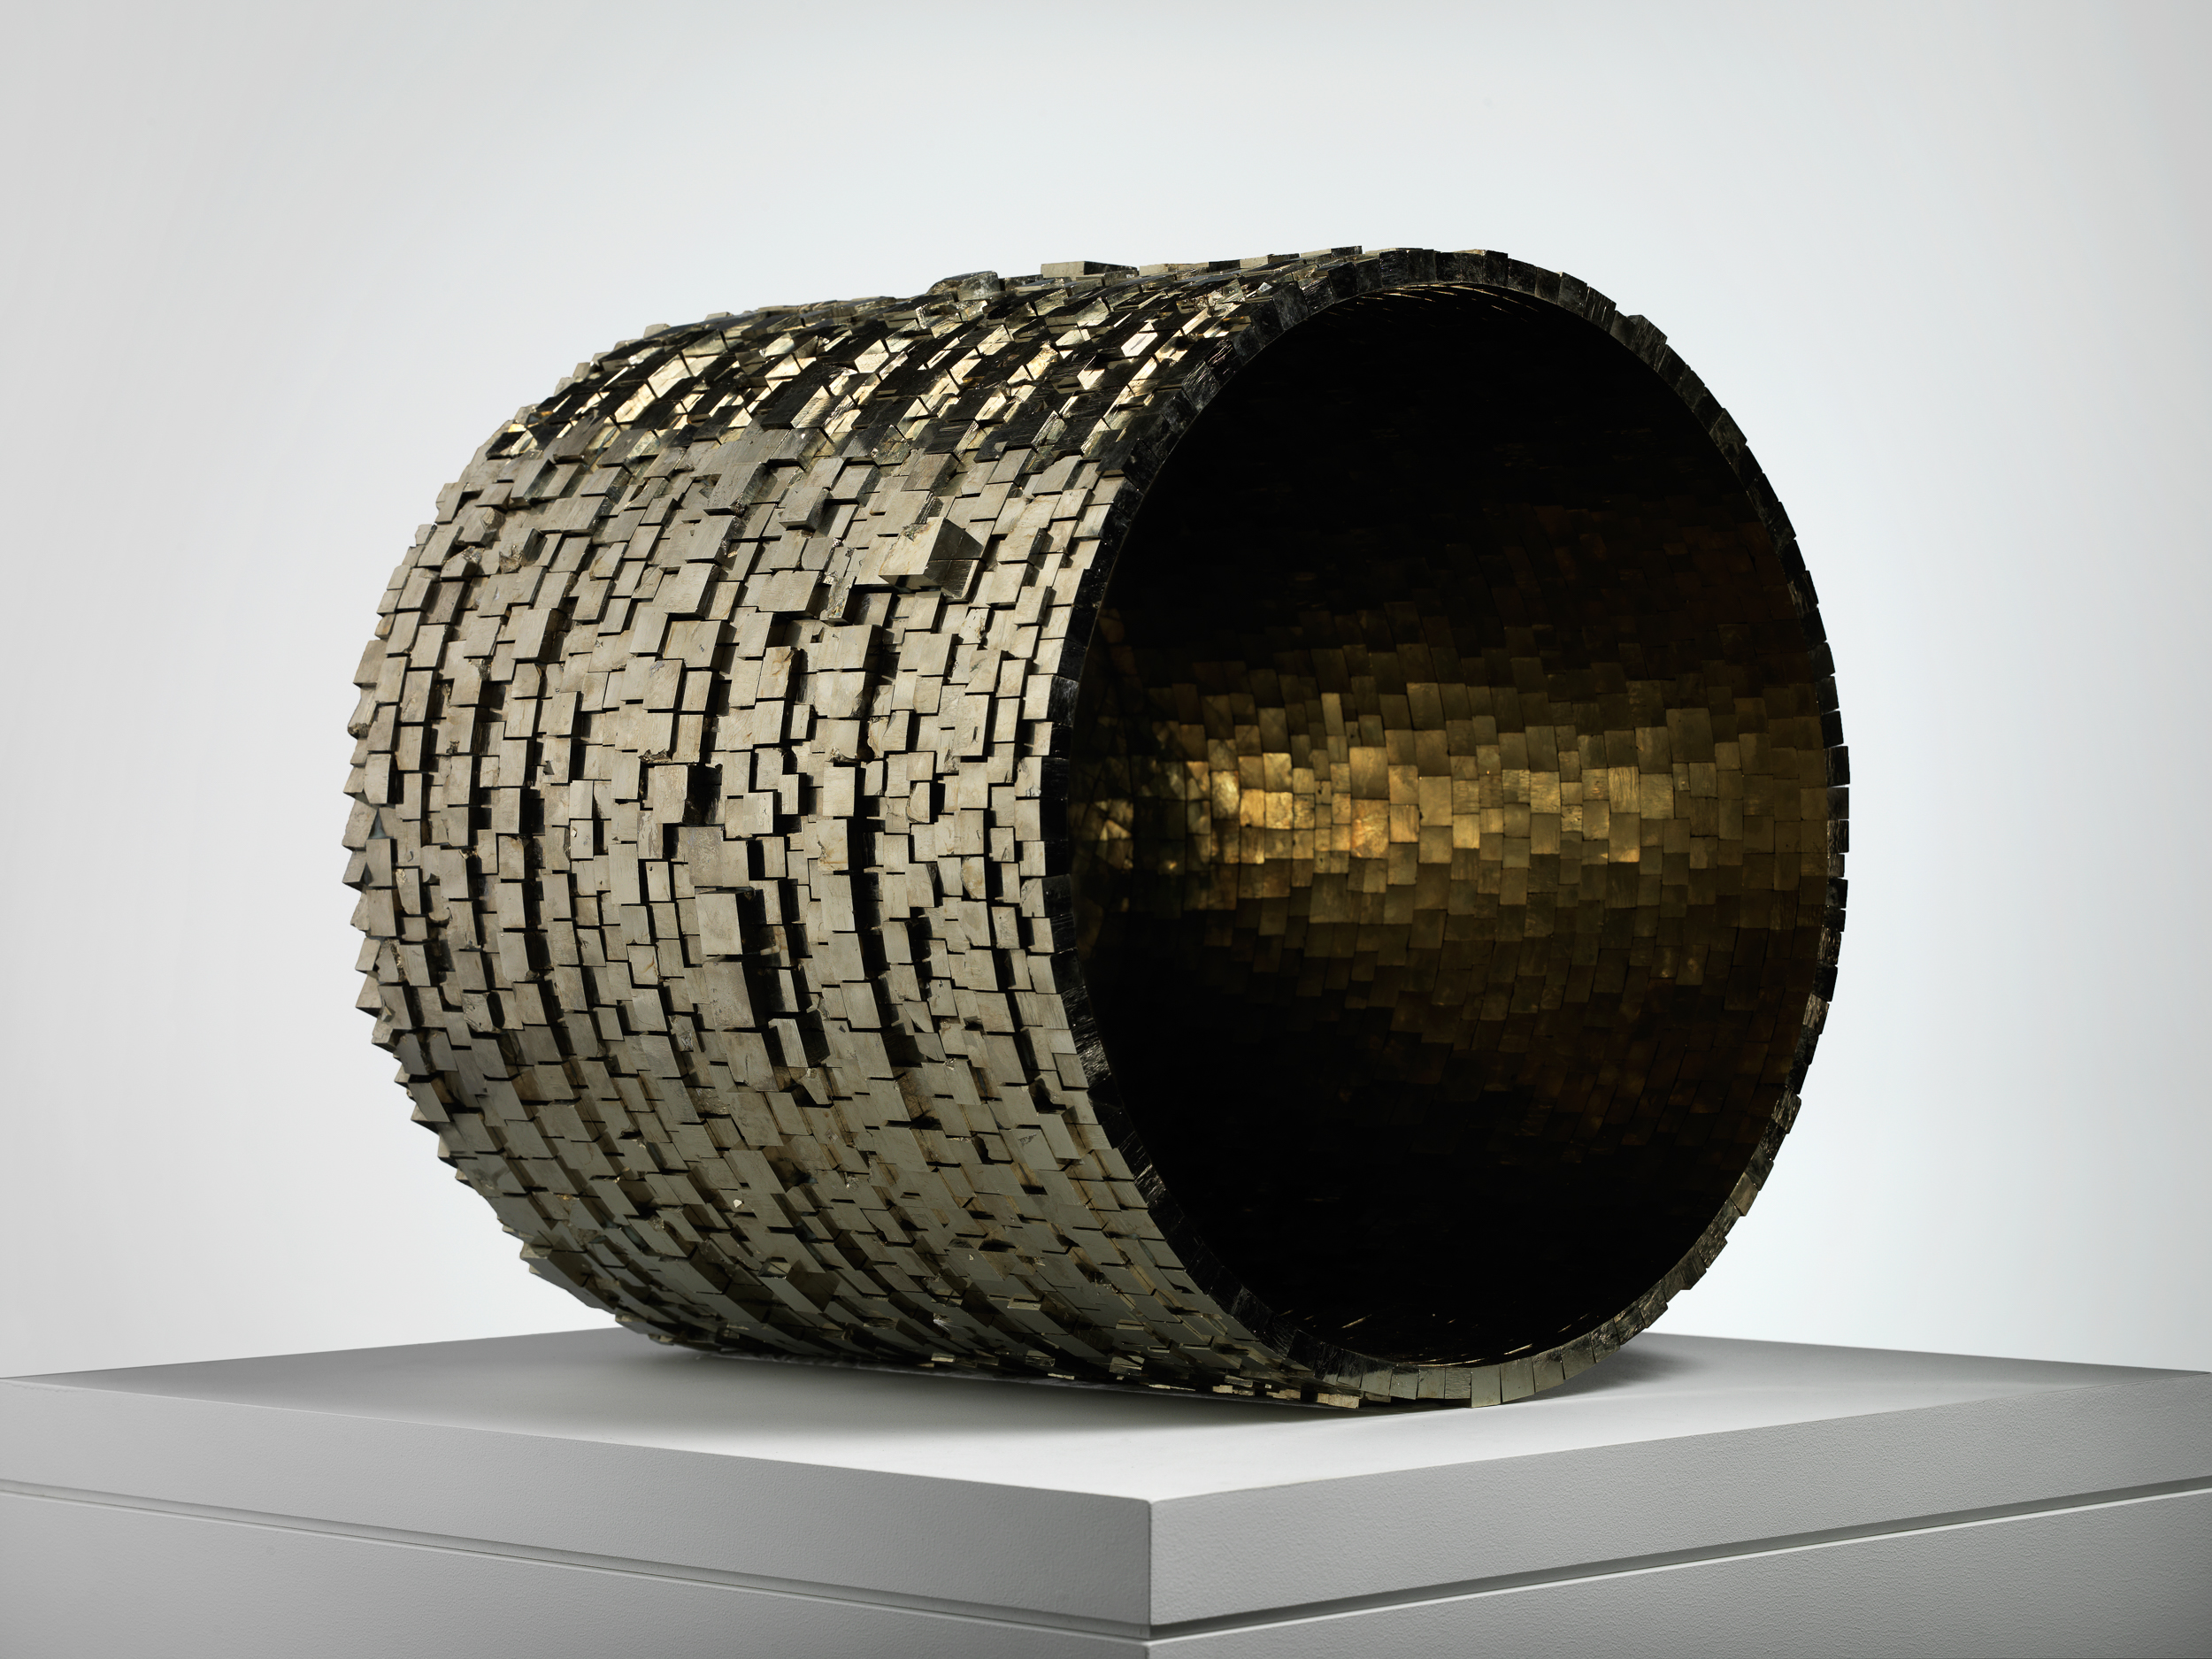 Sans titre (Untitled) 2007–12  Hubert Duprat (Born 1957, Nérac, France; lives and works in southern France) Pyrite crystal, glue  52 x 52 x 52 cm Courtesy of Art : Concept, Paris